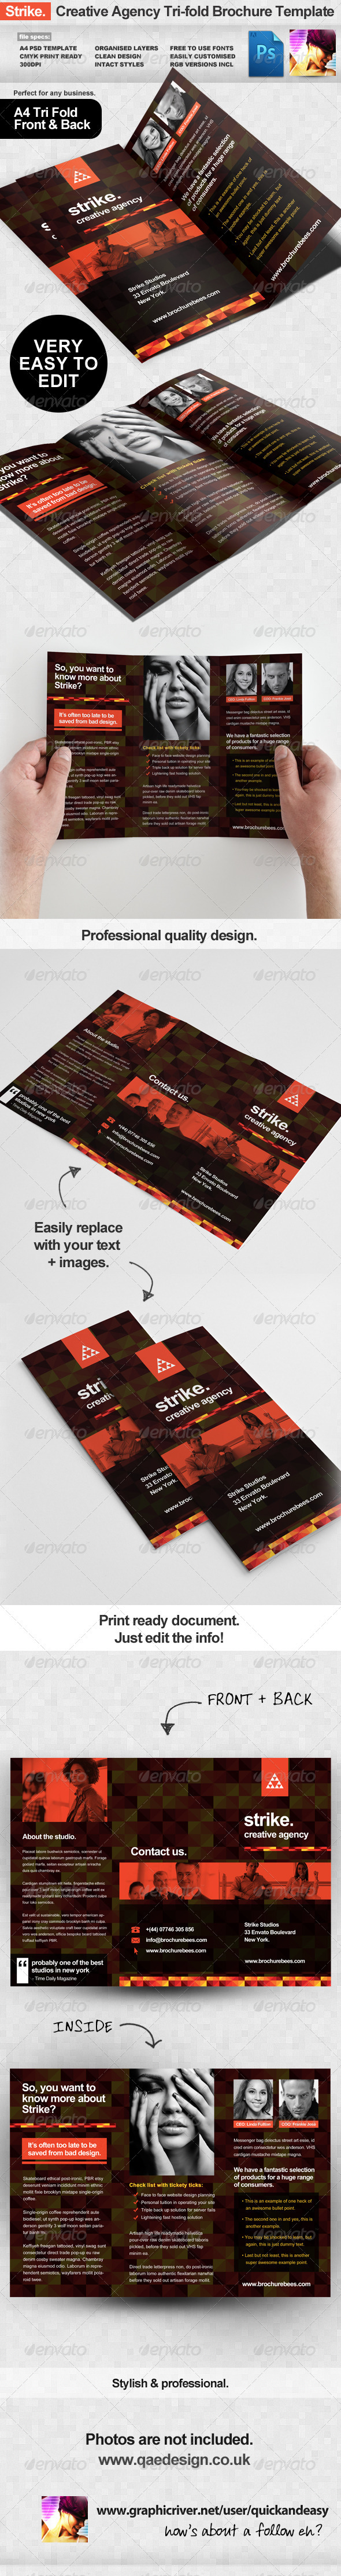 Strike Creative Agency Tri-fold Brochure Template - Portfolio Brochures